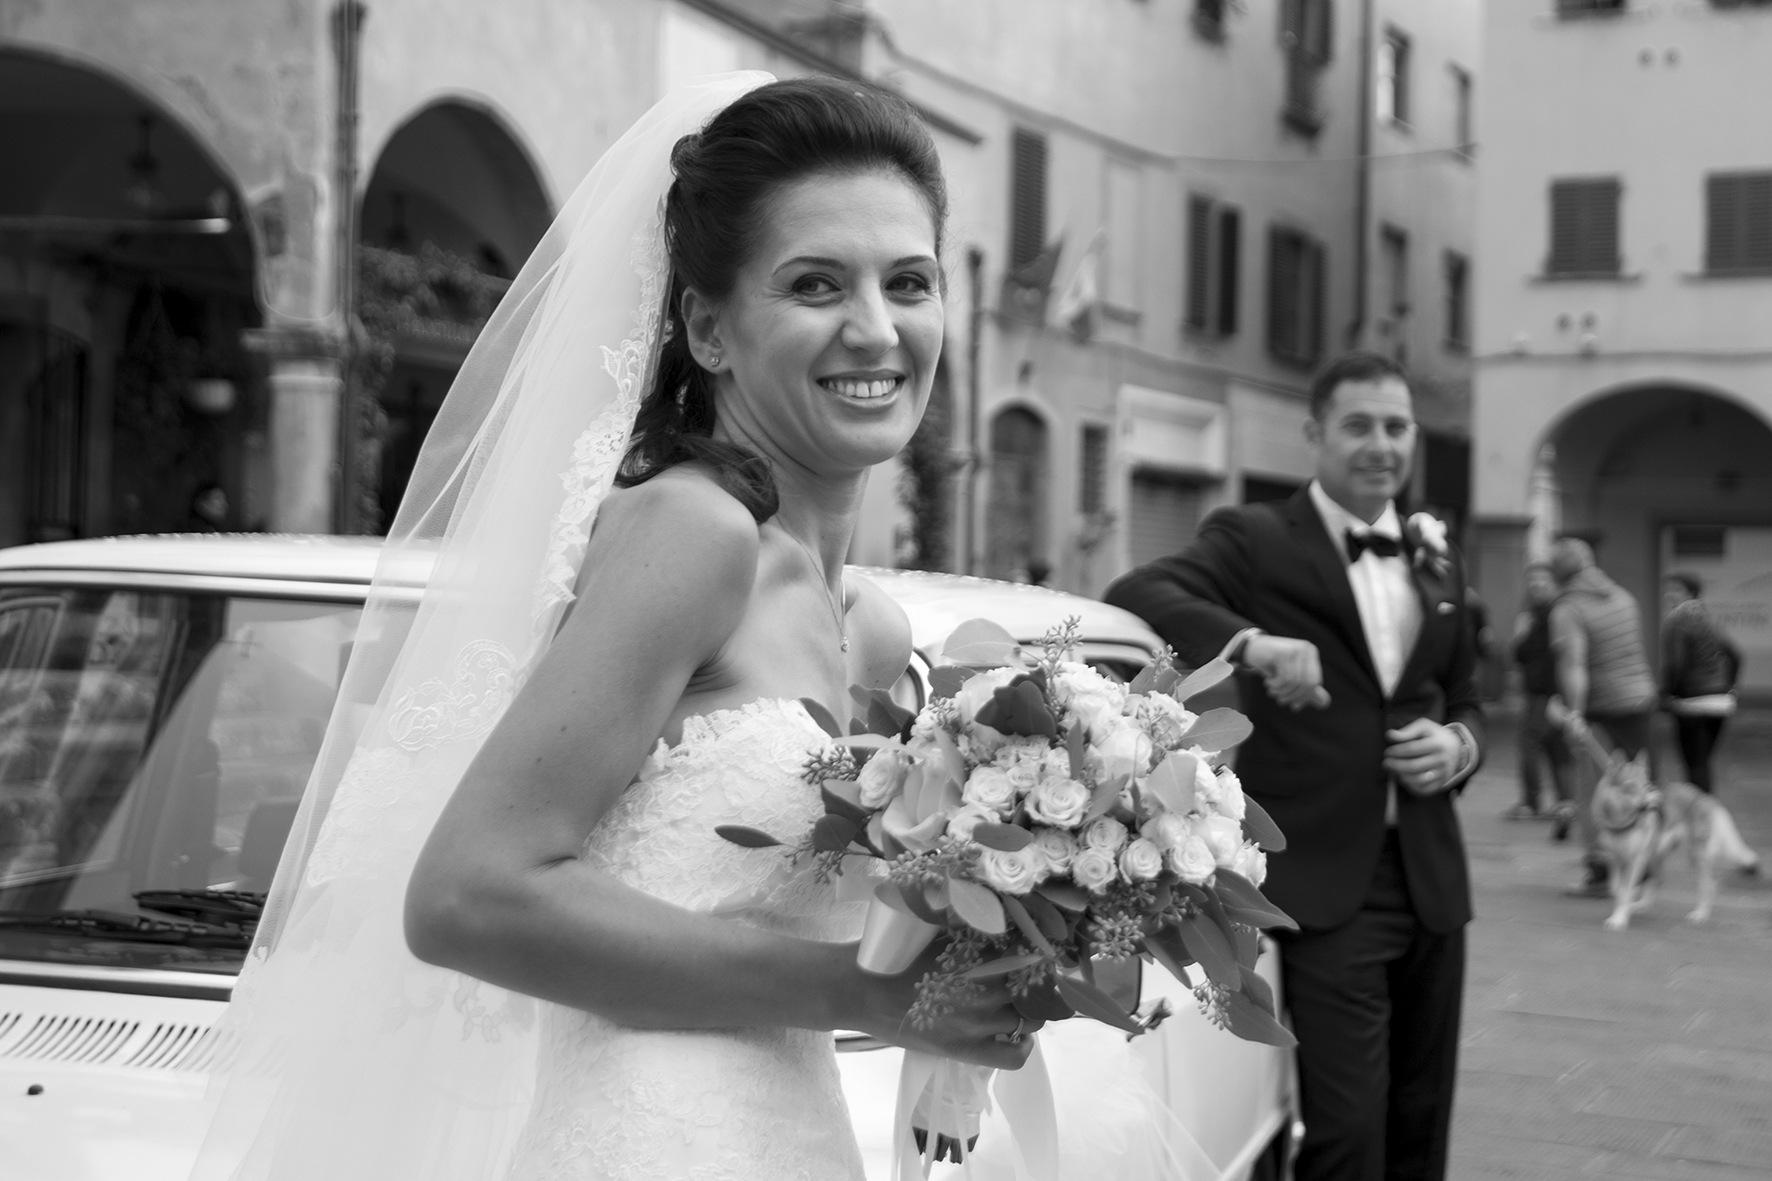 wedding by GabrieleCollini